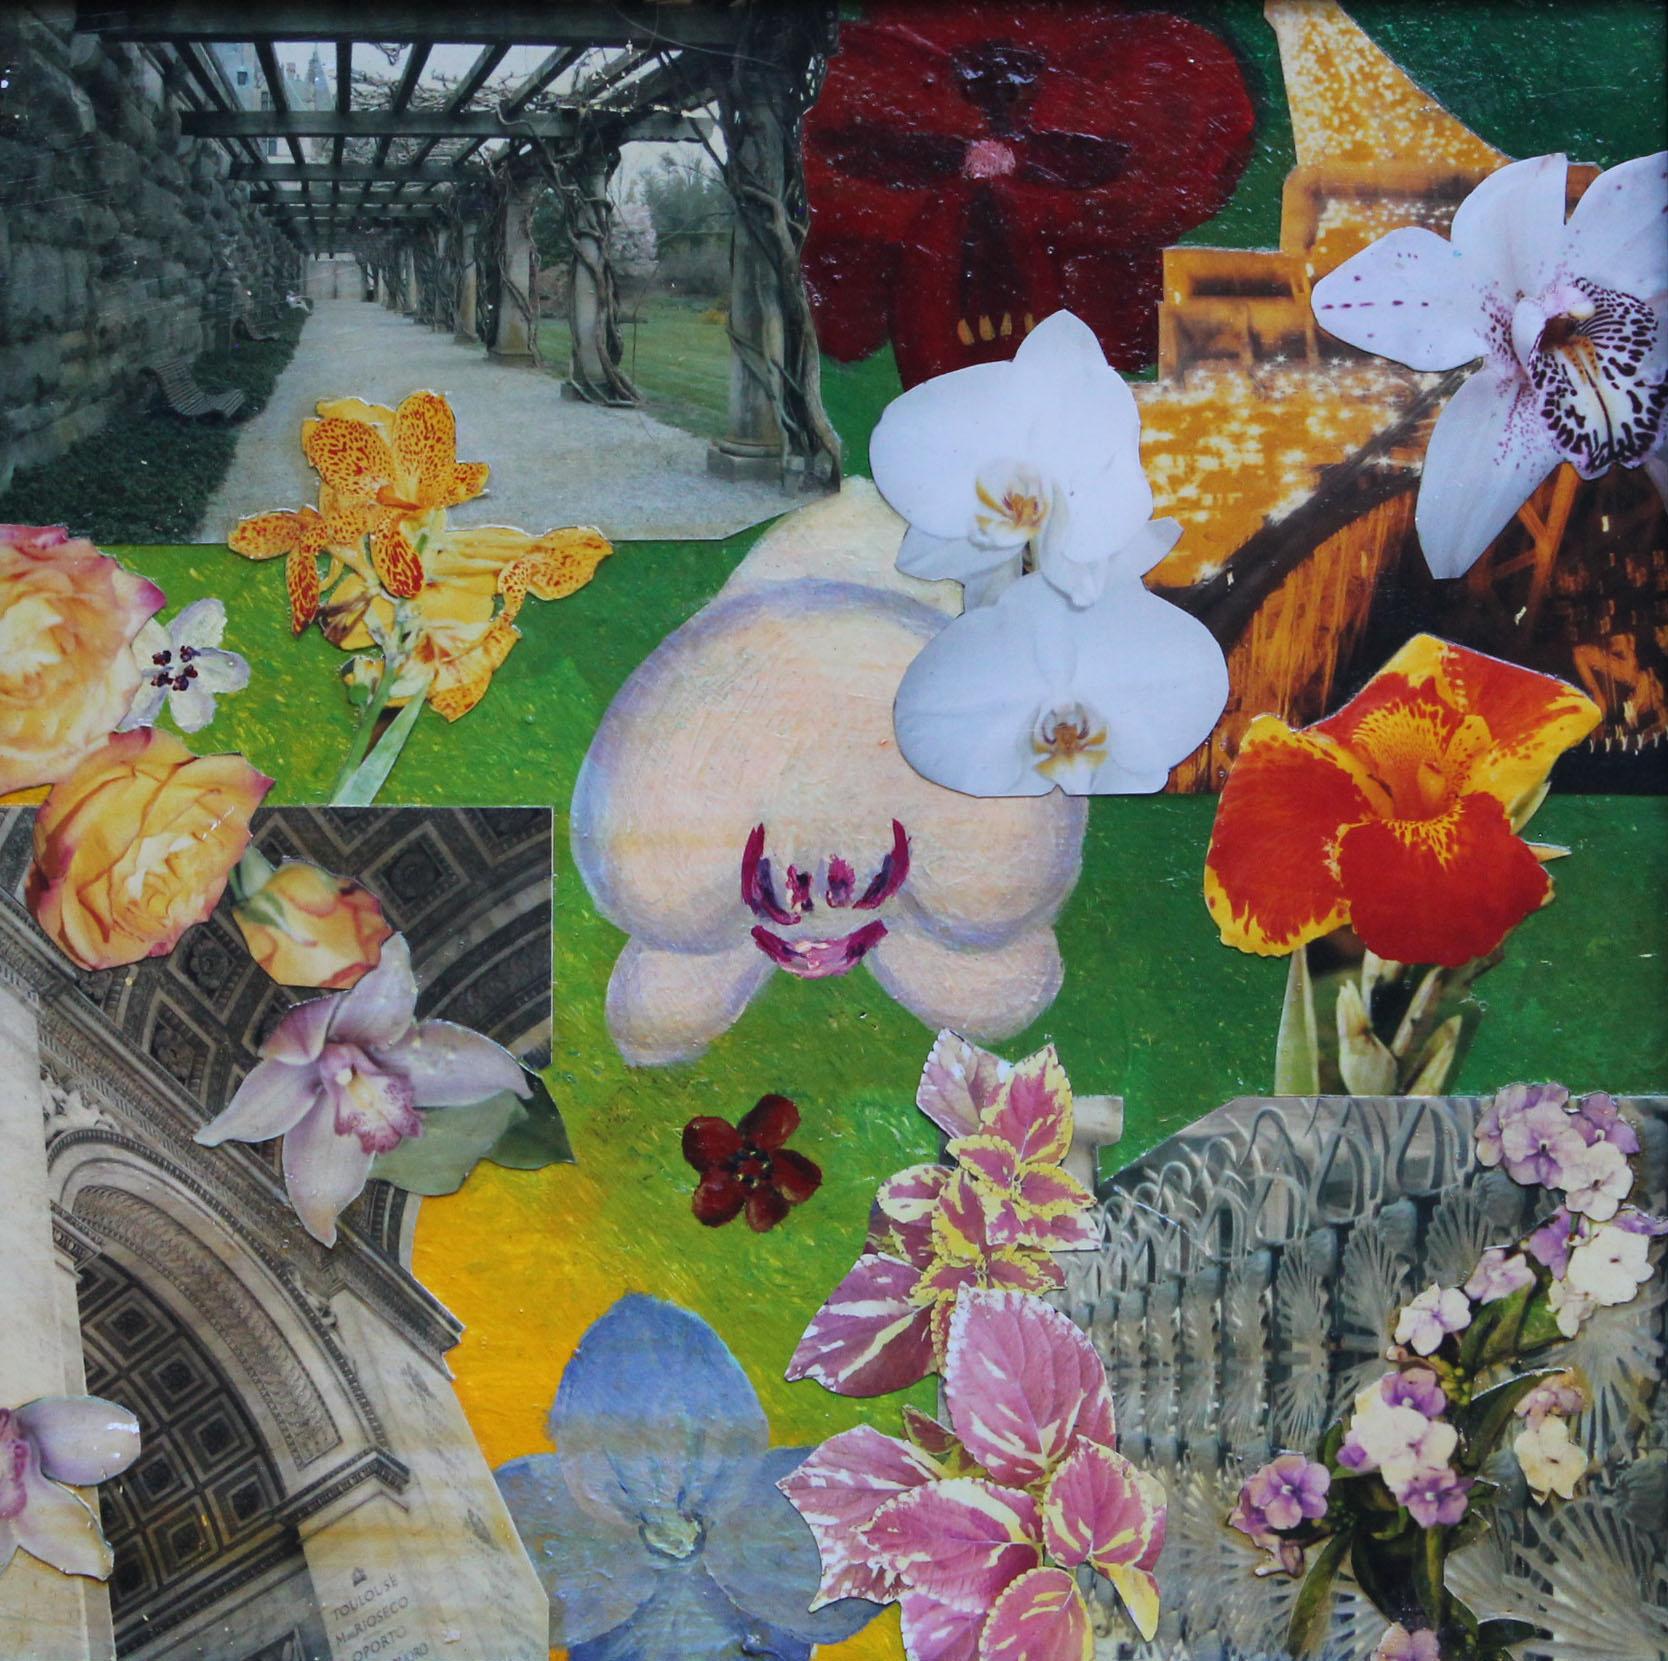 Flowered Travels